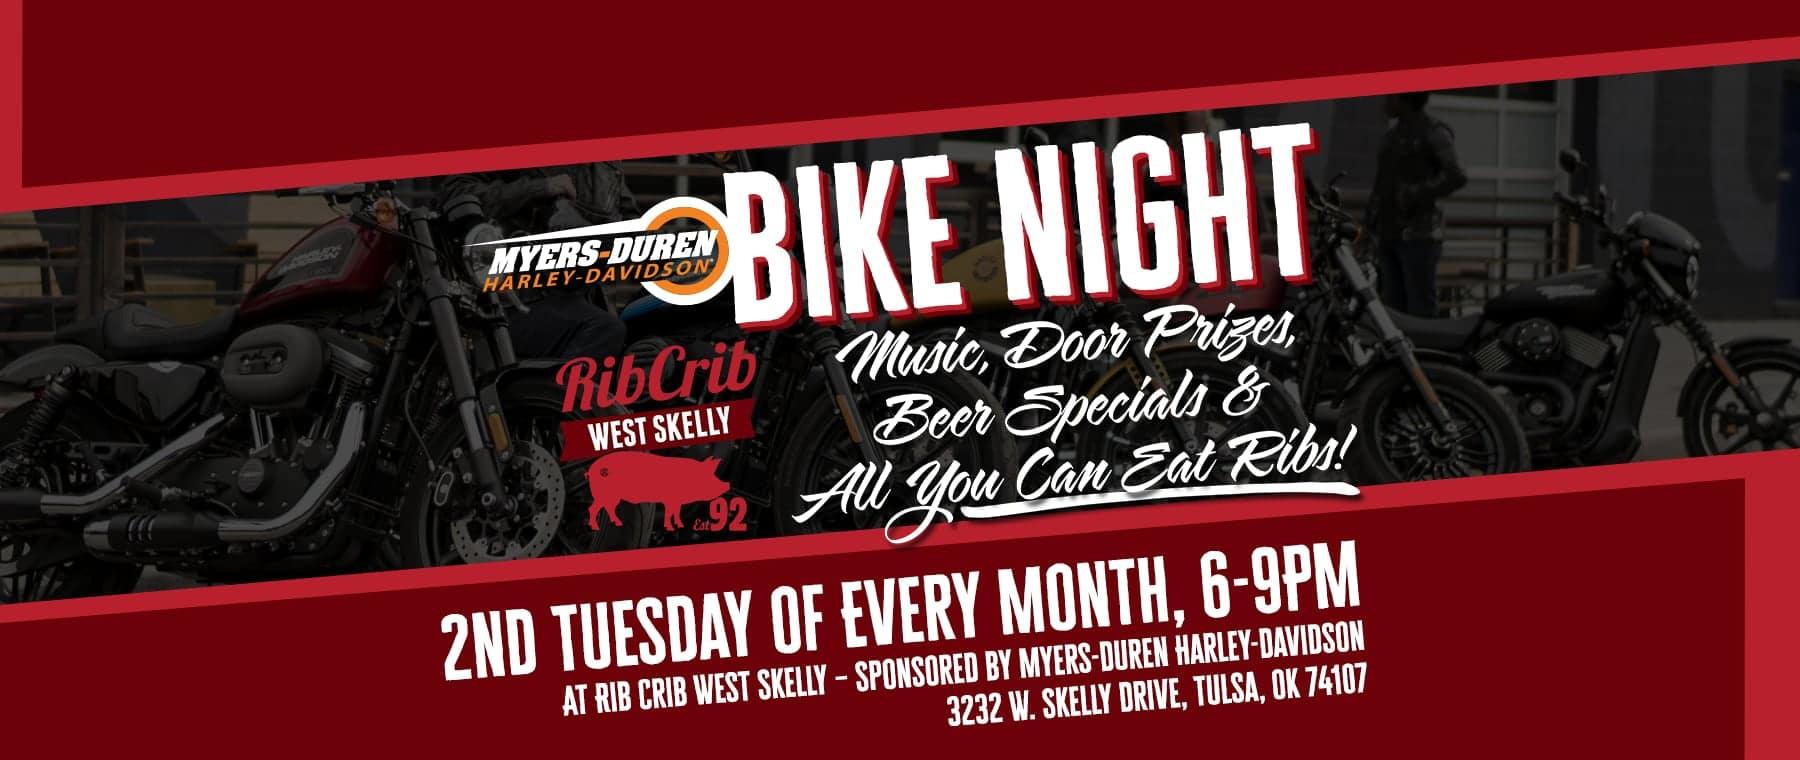 Myers-Duren H-D Bike Nights at Rib Crib West Skelly in Tulsa, Oklahoma